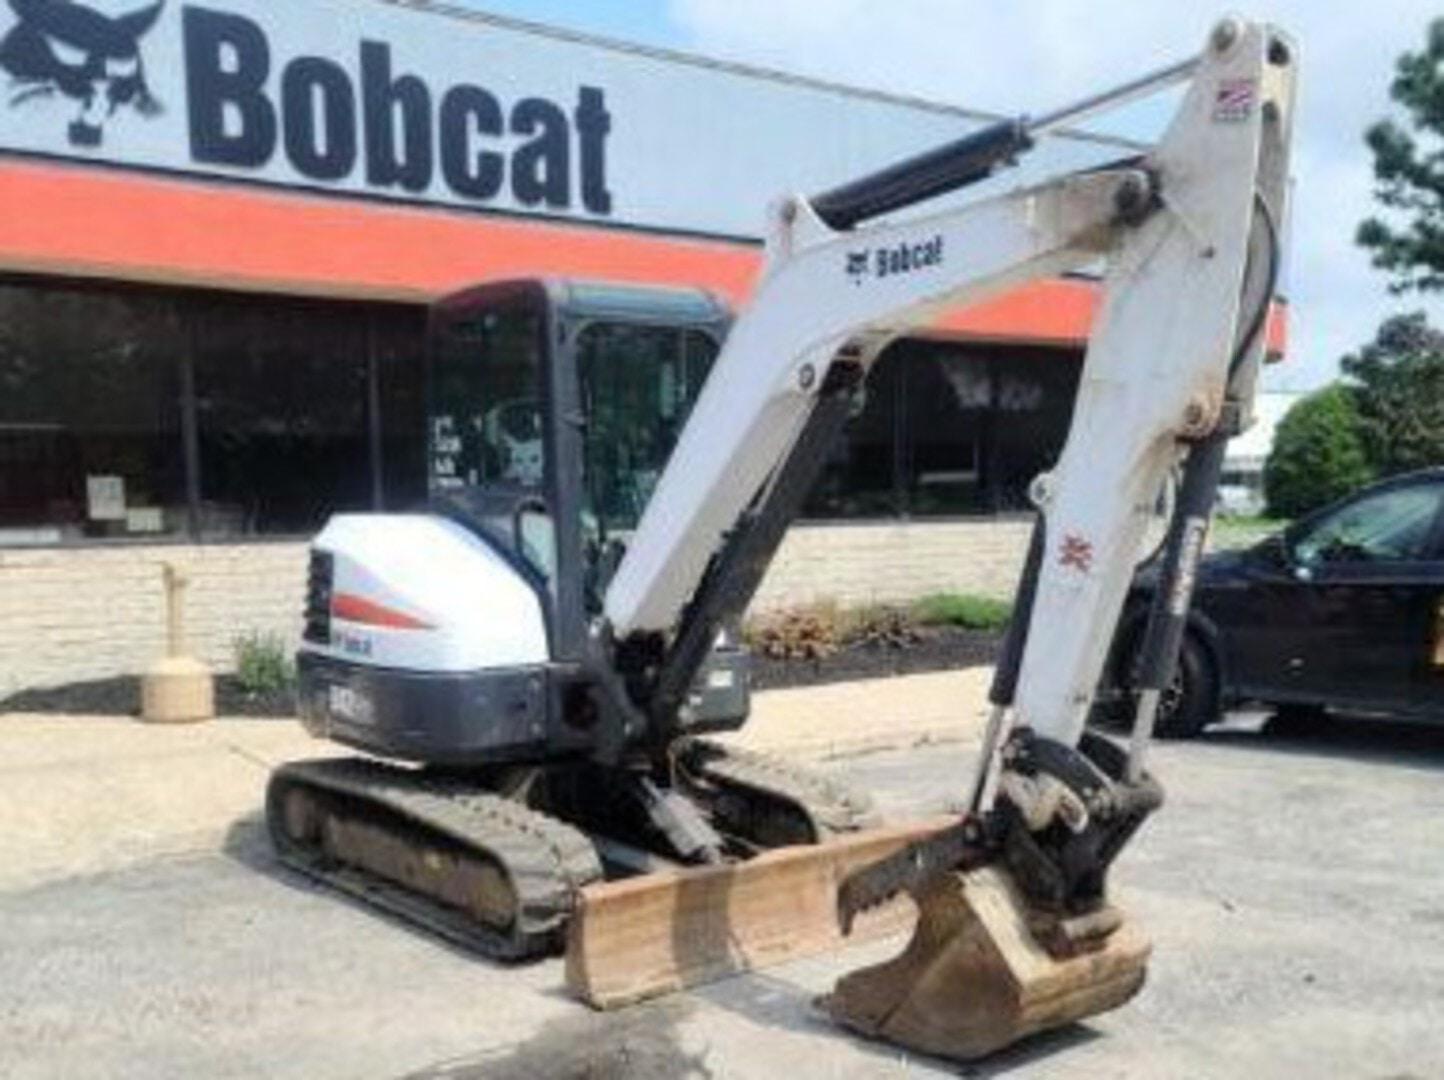 Used, 2016, Bobcat, E42 T4 Long Arm, Excavators